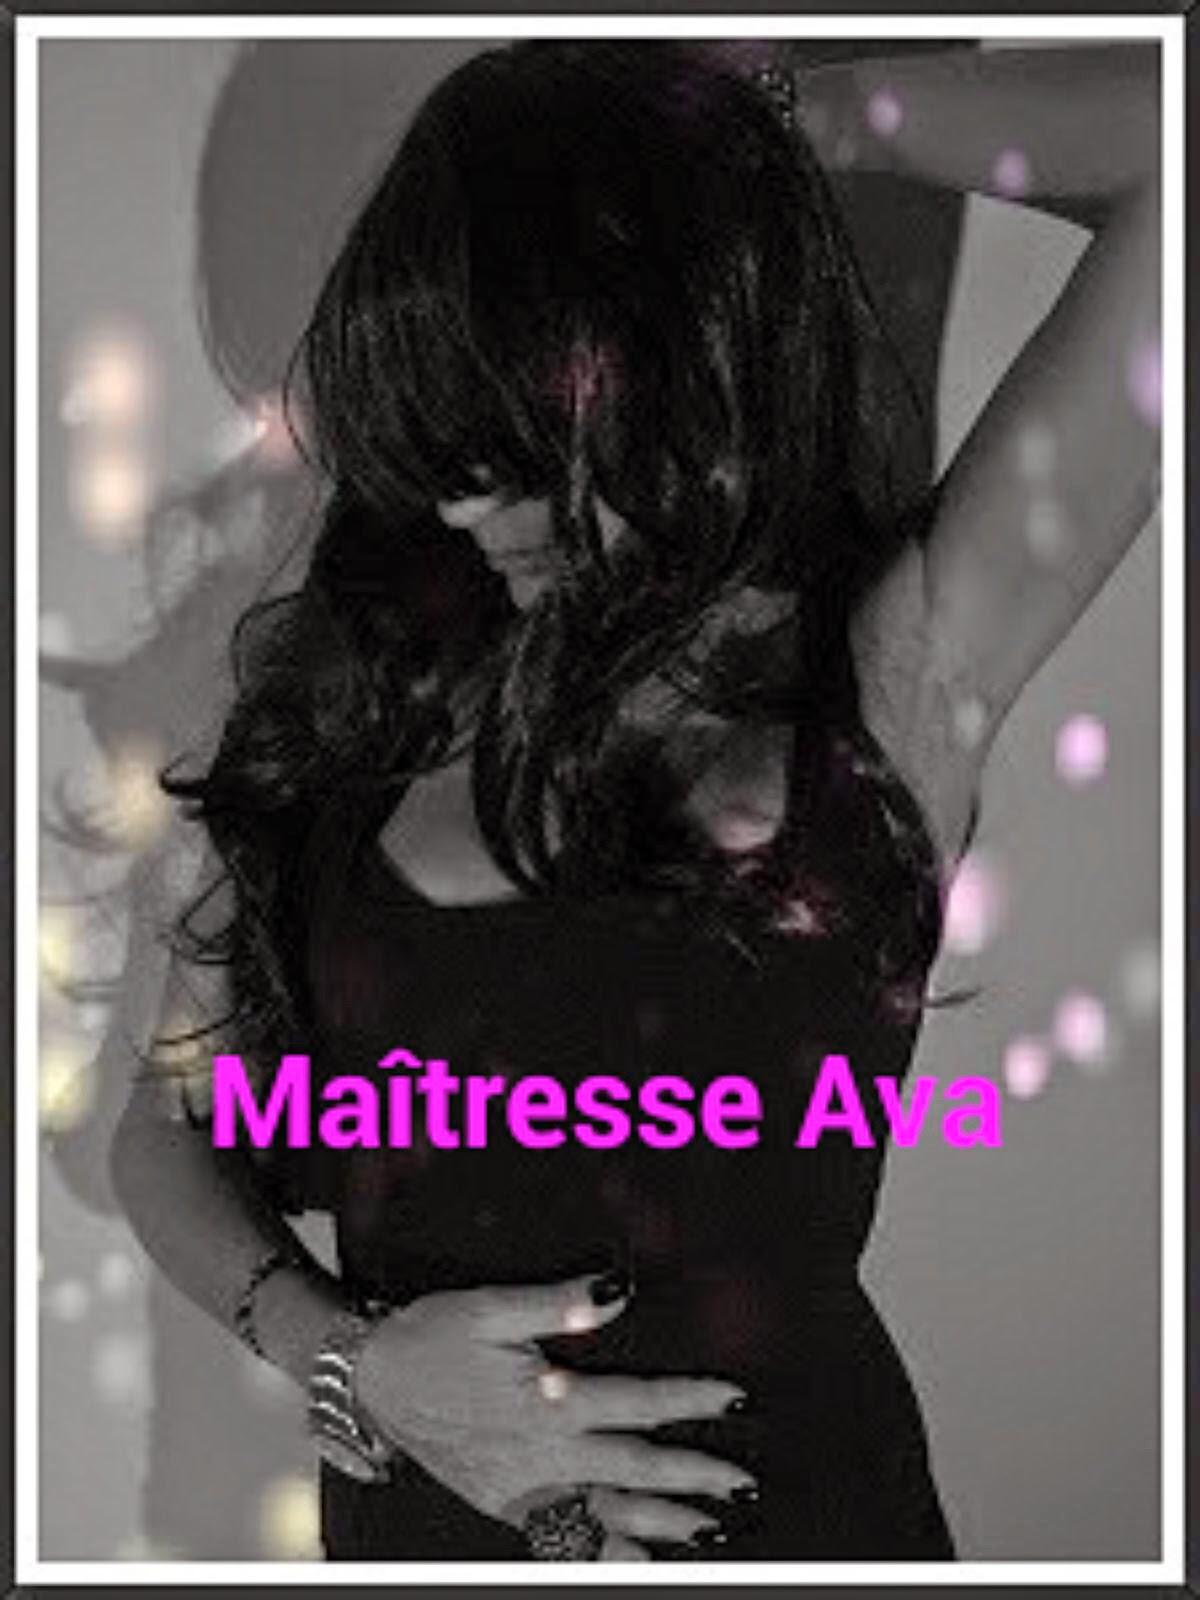 Maîtresse Ava.